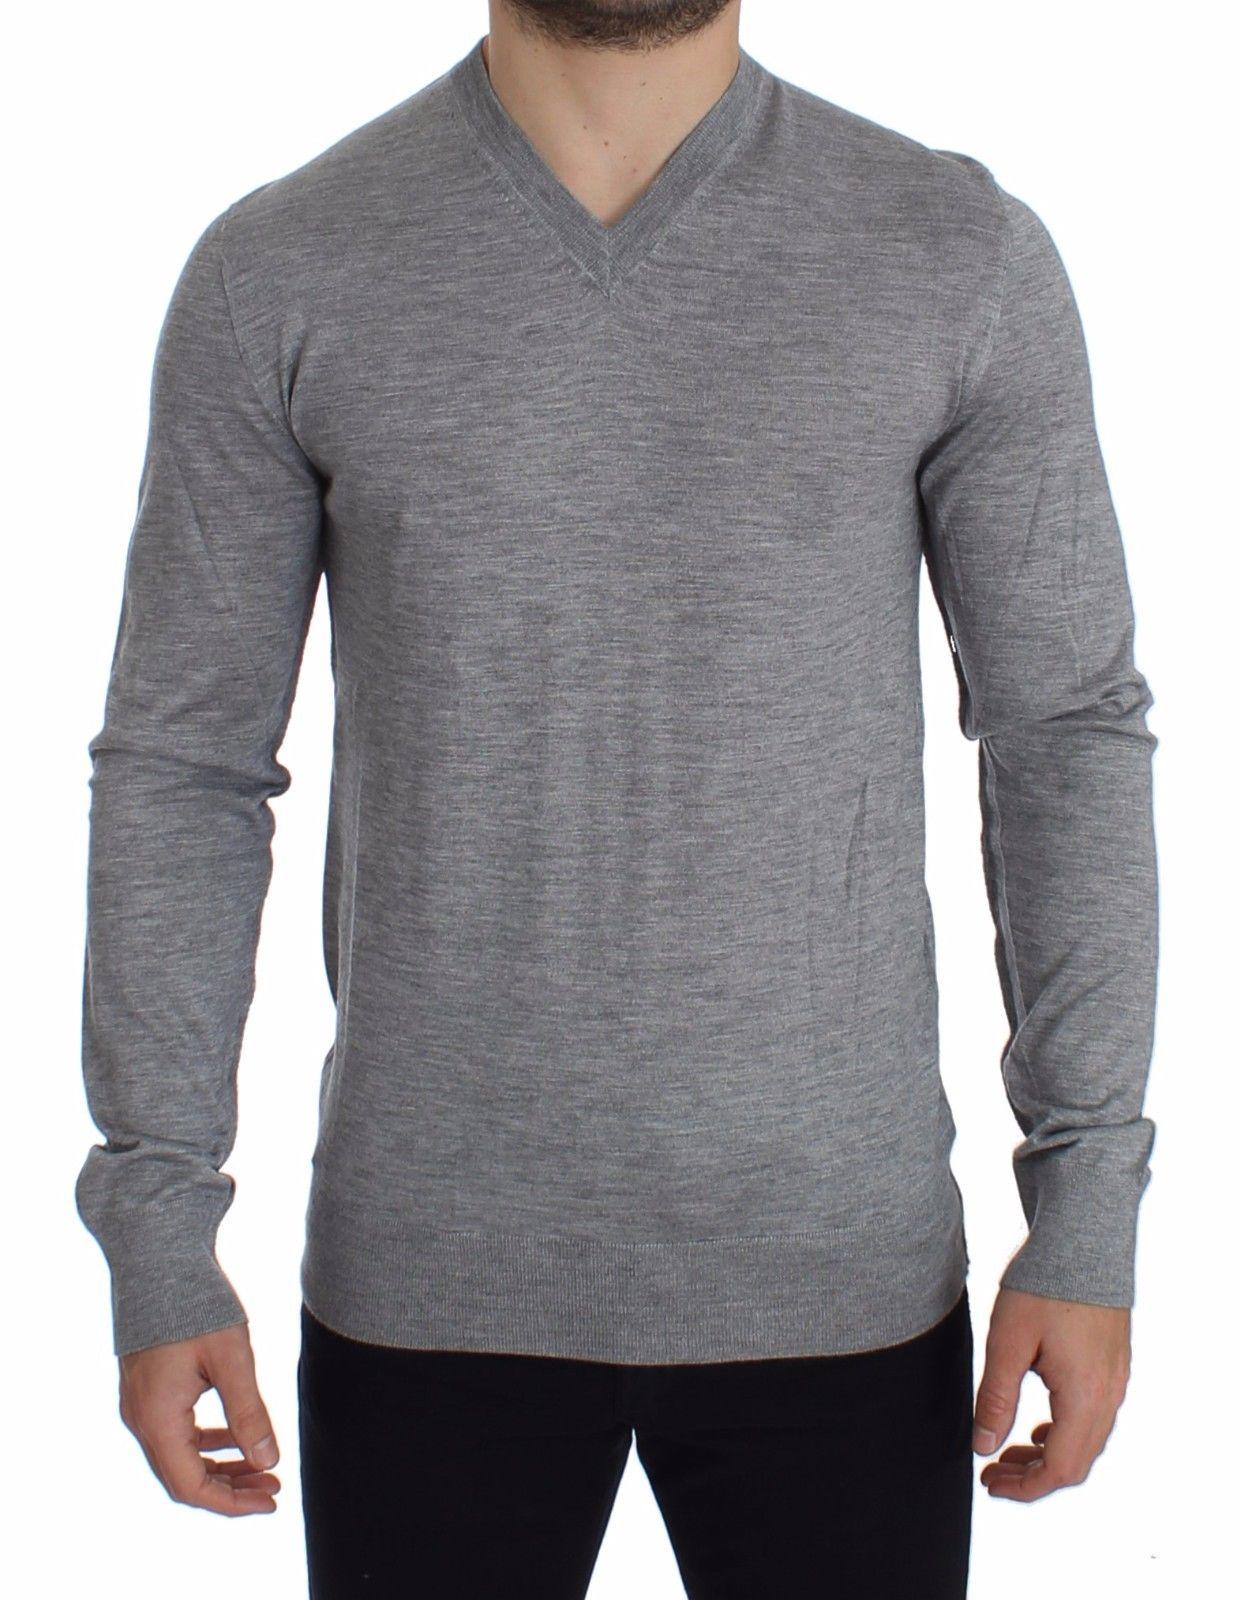 Dolce & Gabbana Men's Silk Cashmere V-neck Sweater Pullover Gray SIG14004 - IT44   XS